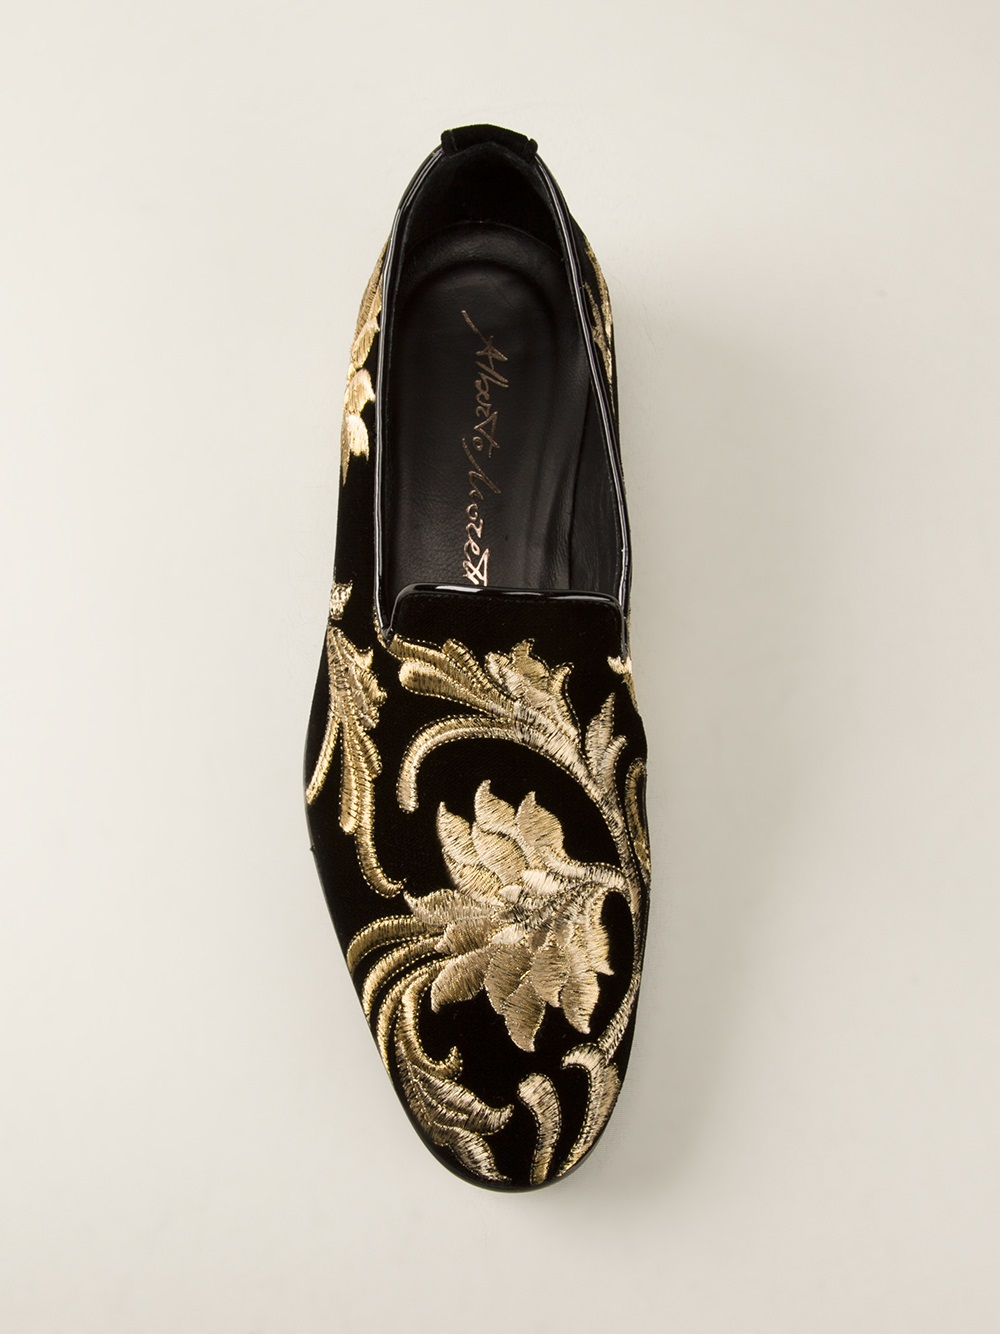 mens slippers tesco image skirt and slipper. Black Bedroom Furniture Sets. Home Design Ideas